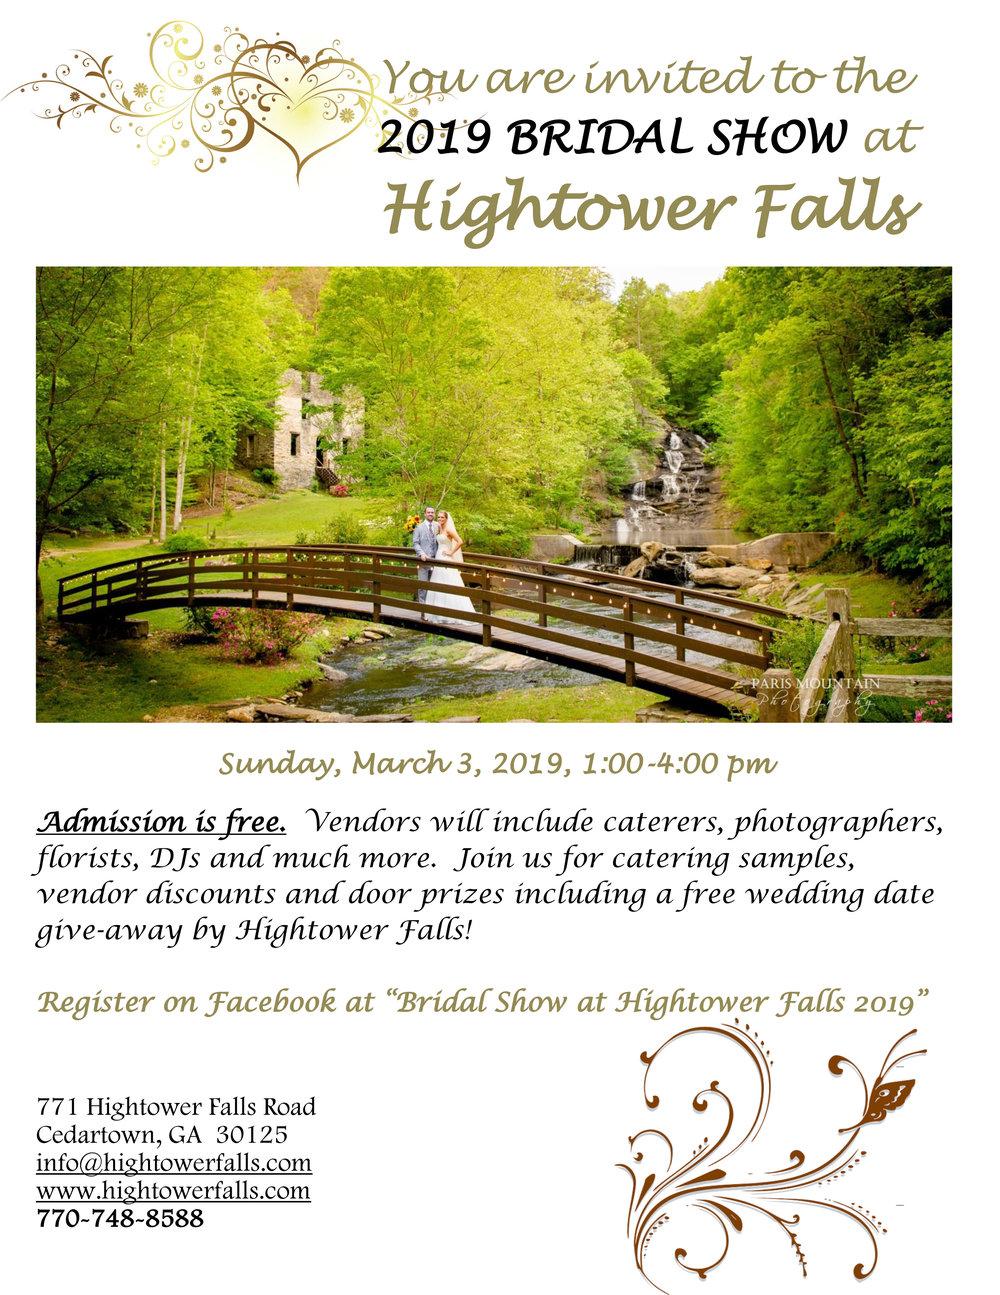 Hightower Falls Bridal Show 2019